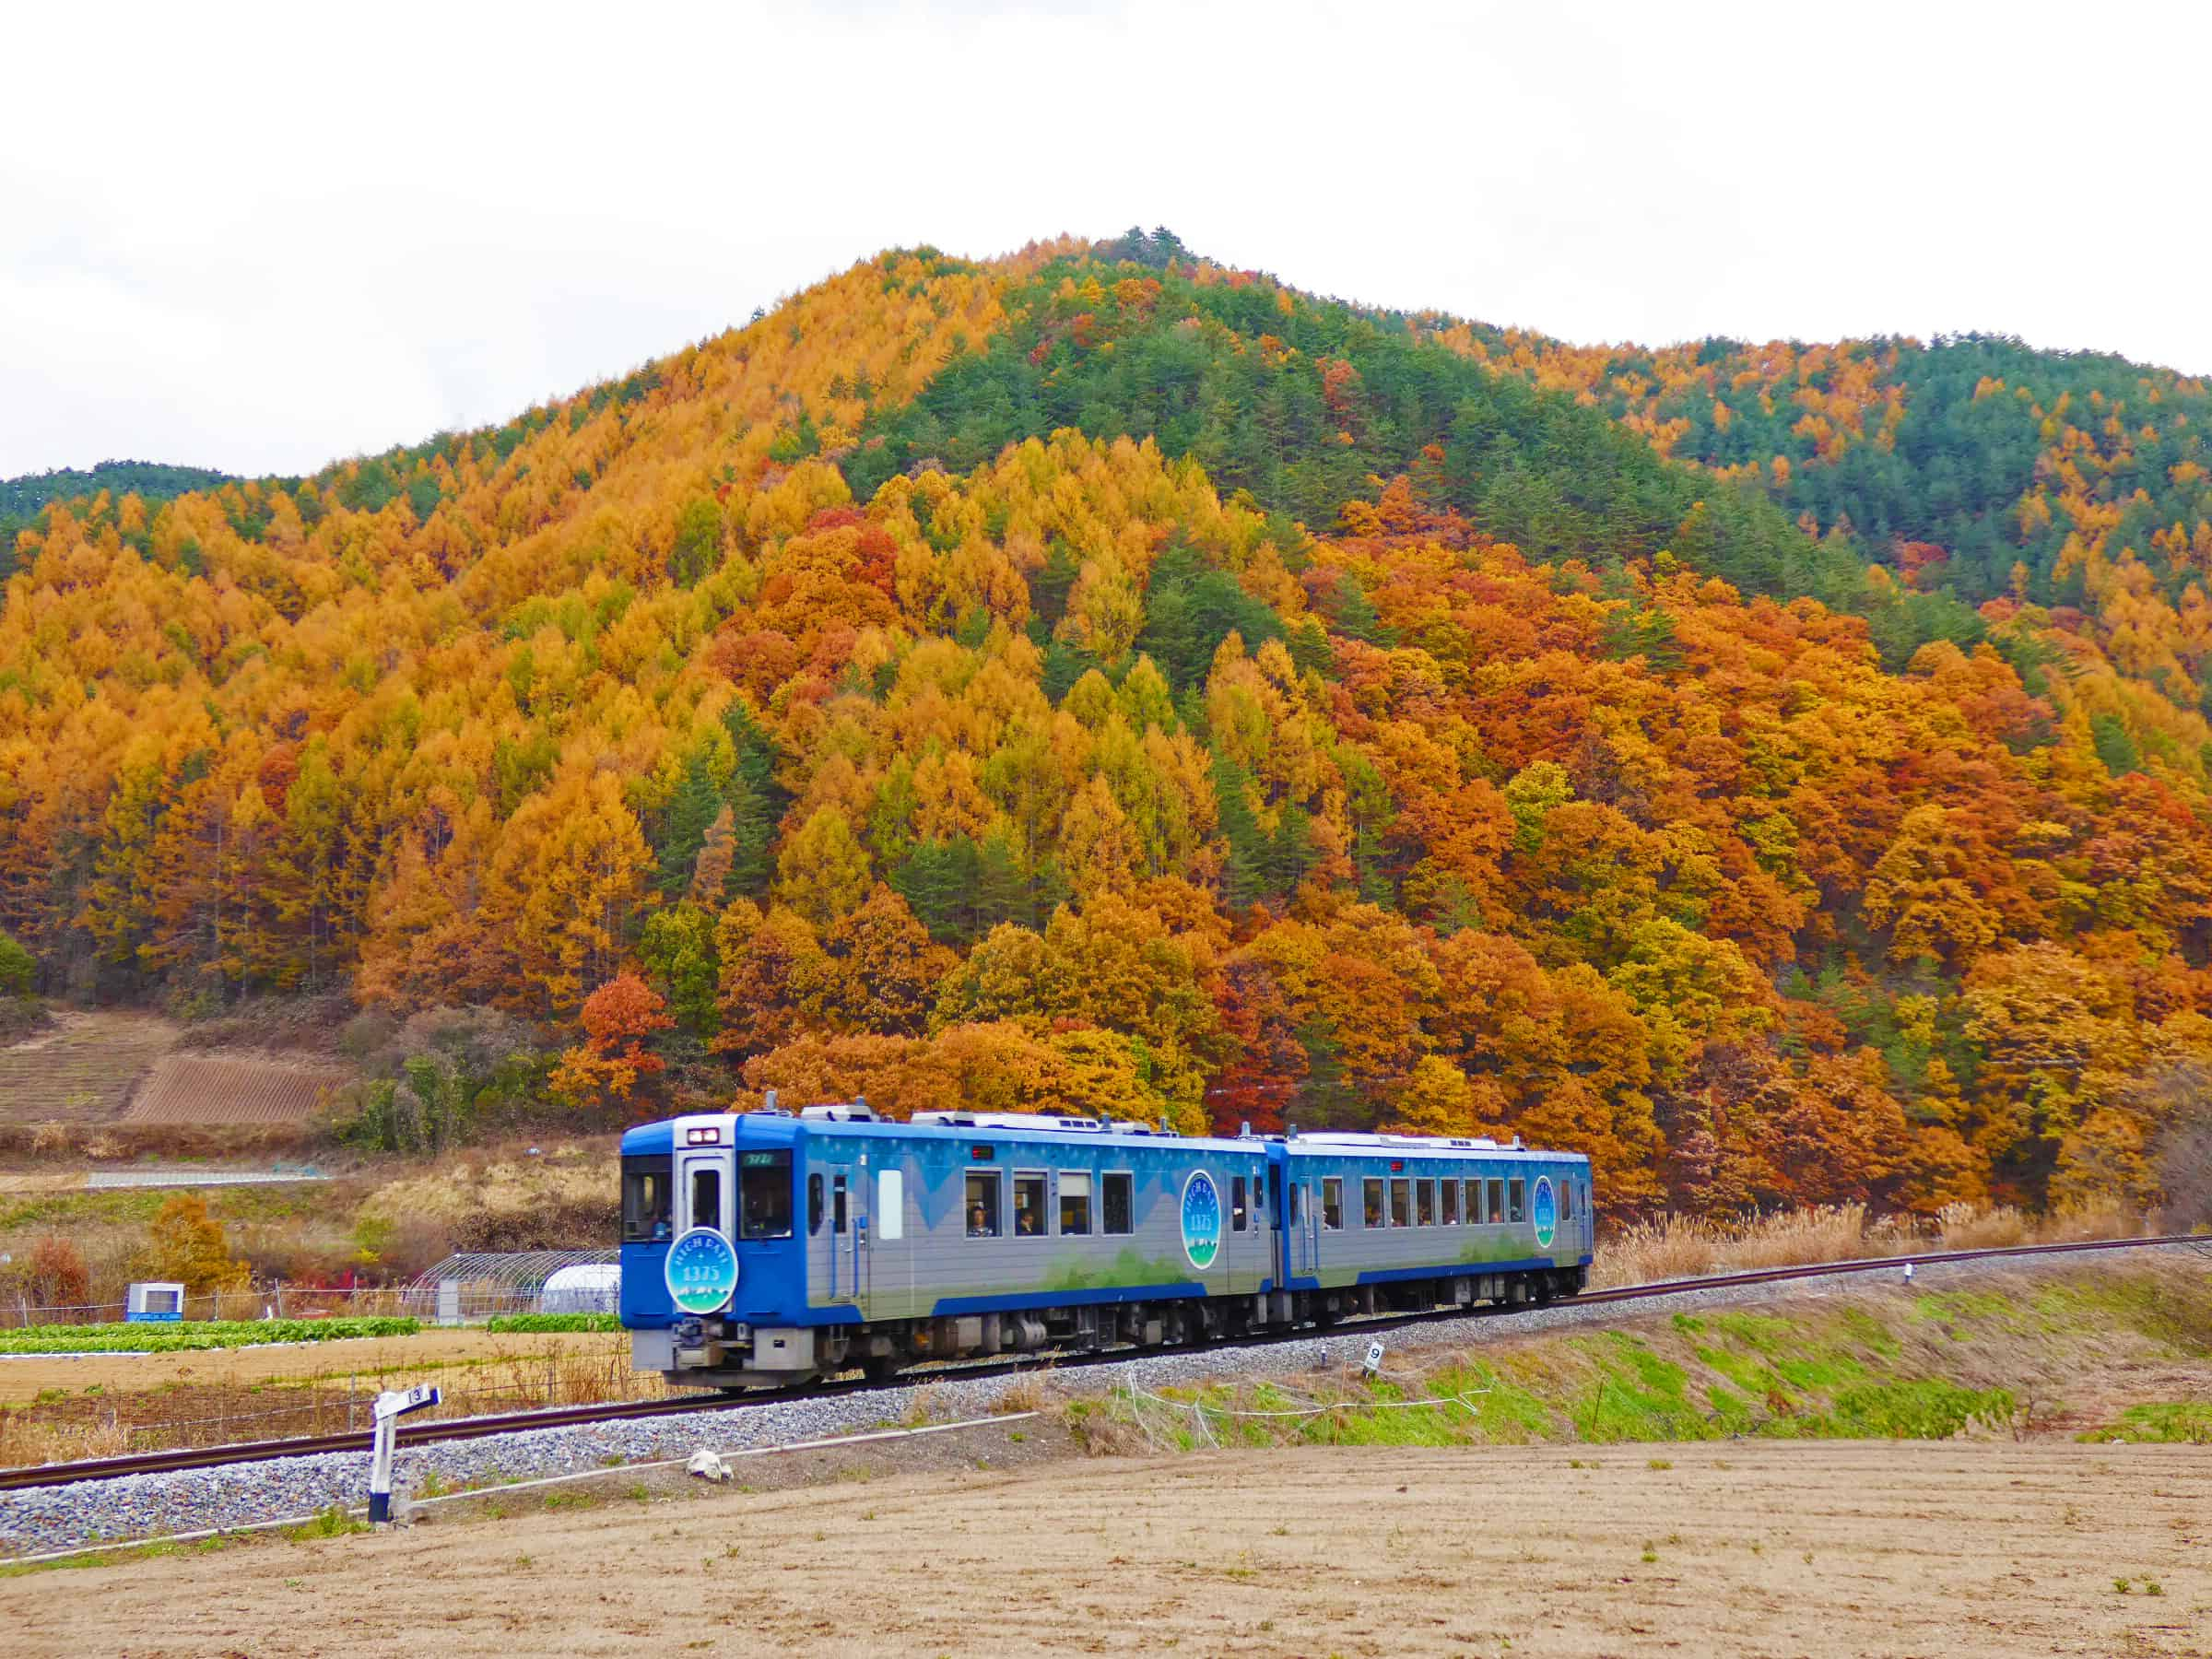 Joyful Train HIGH RAIL 1375 ขบวนสีฟ้าที่โดดเด่นท่ามกลางใบไม้เปลี่ยนสี